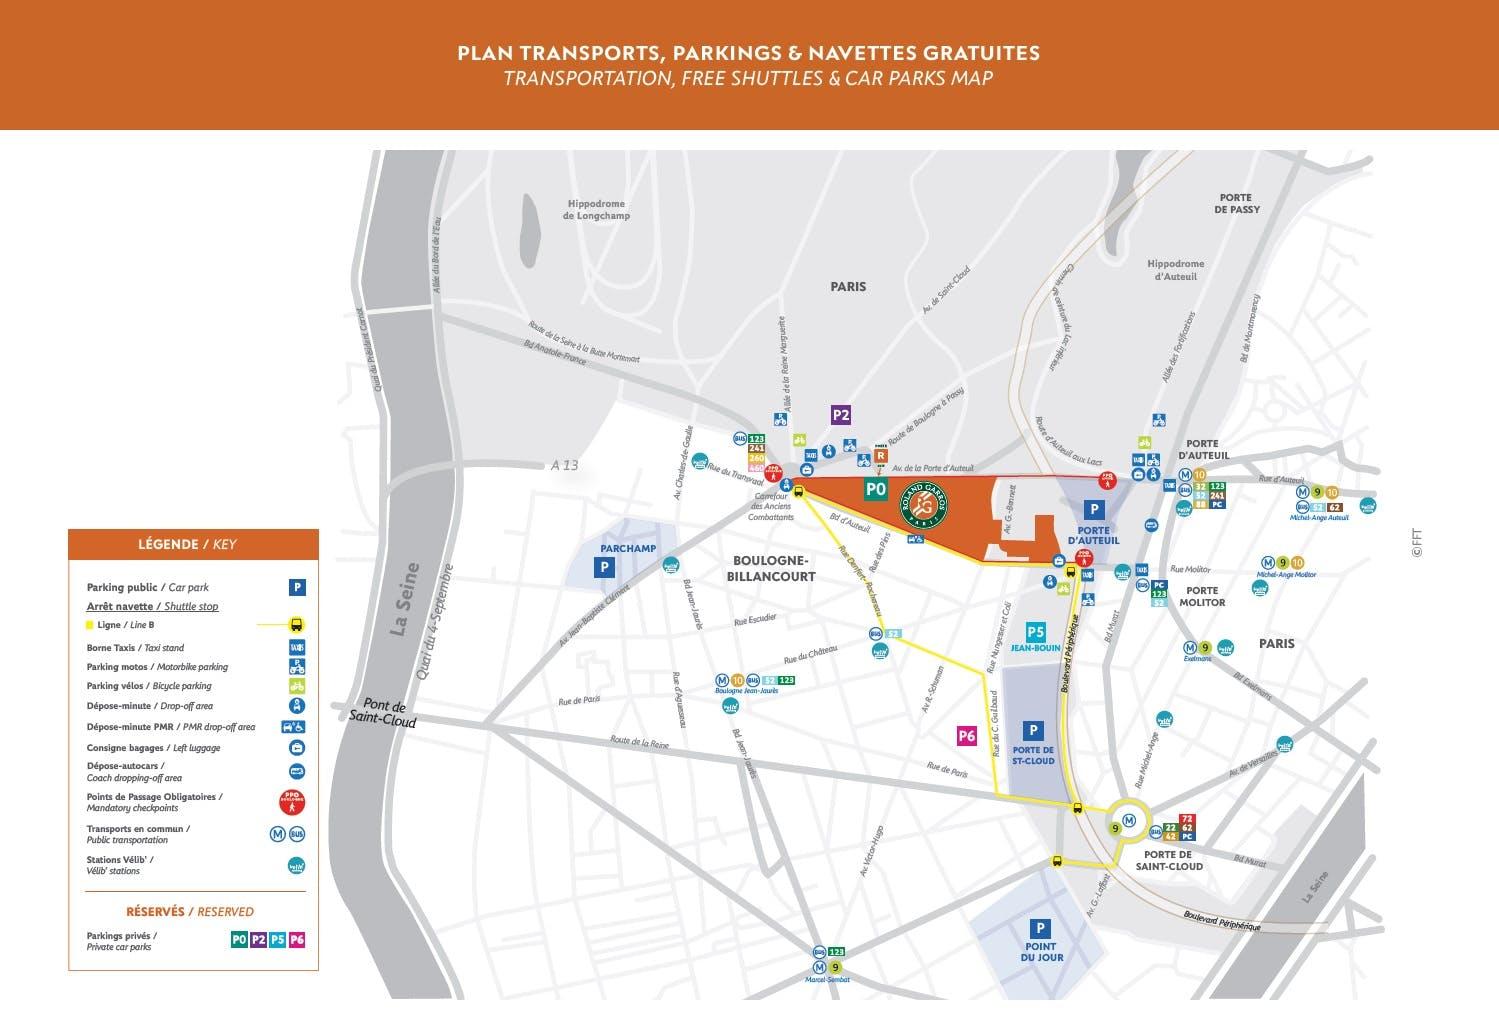 Transportation, free shuttles & car parks map 2020